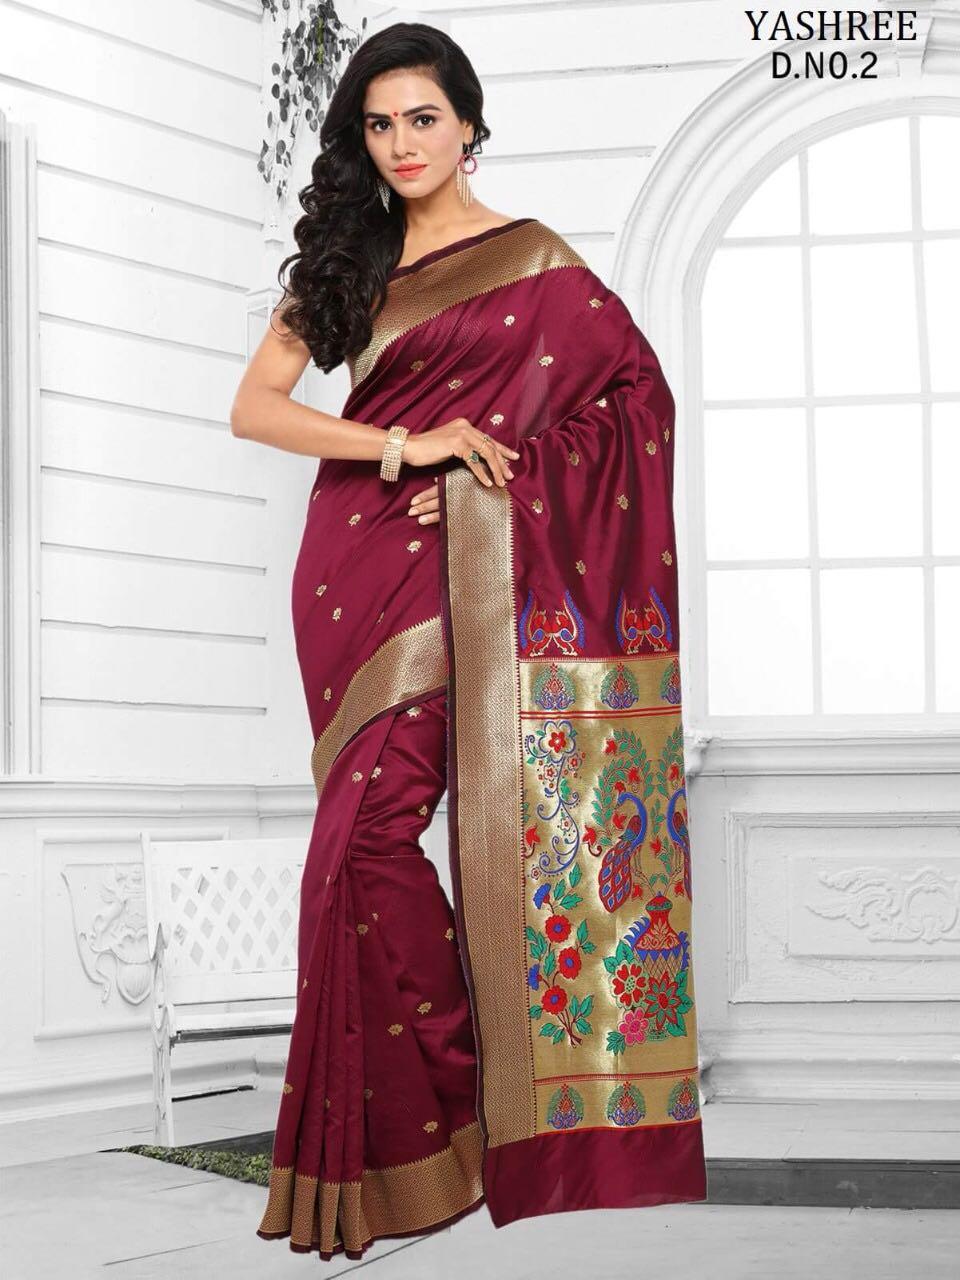 Yadunandan Fashion Yashree 2